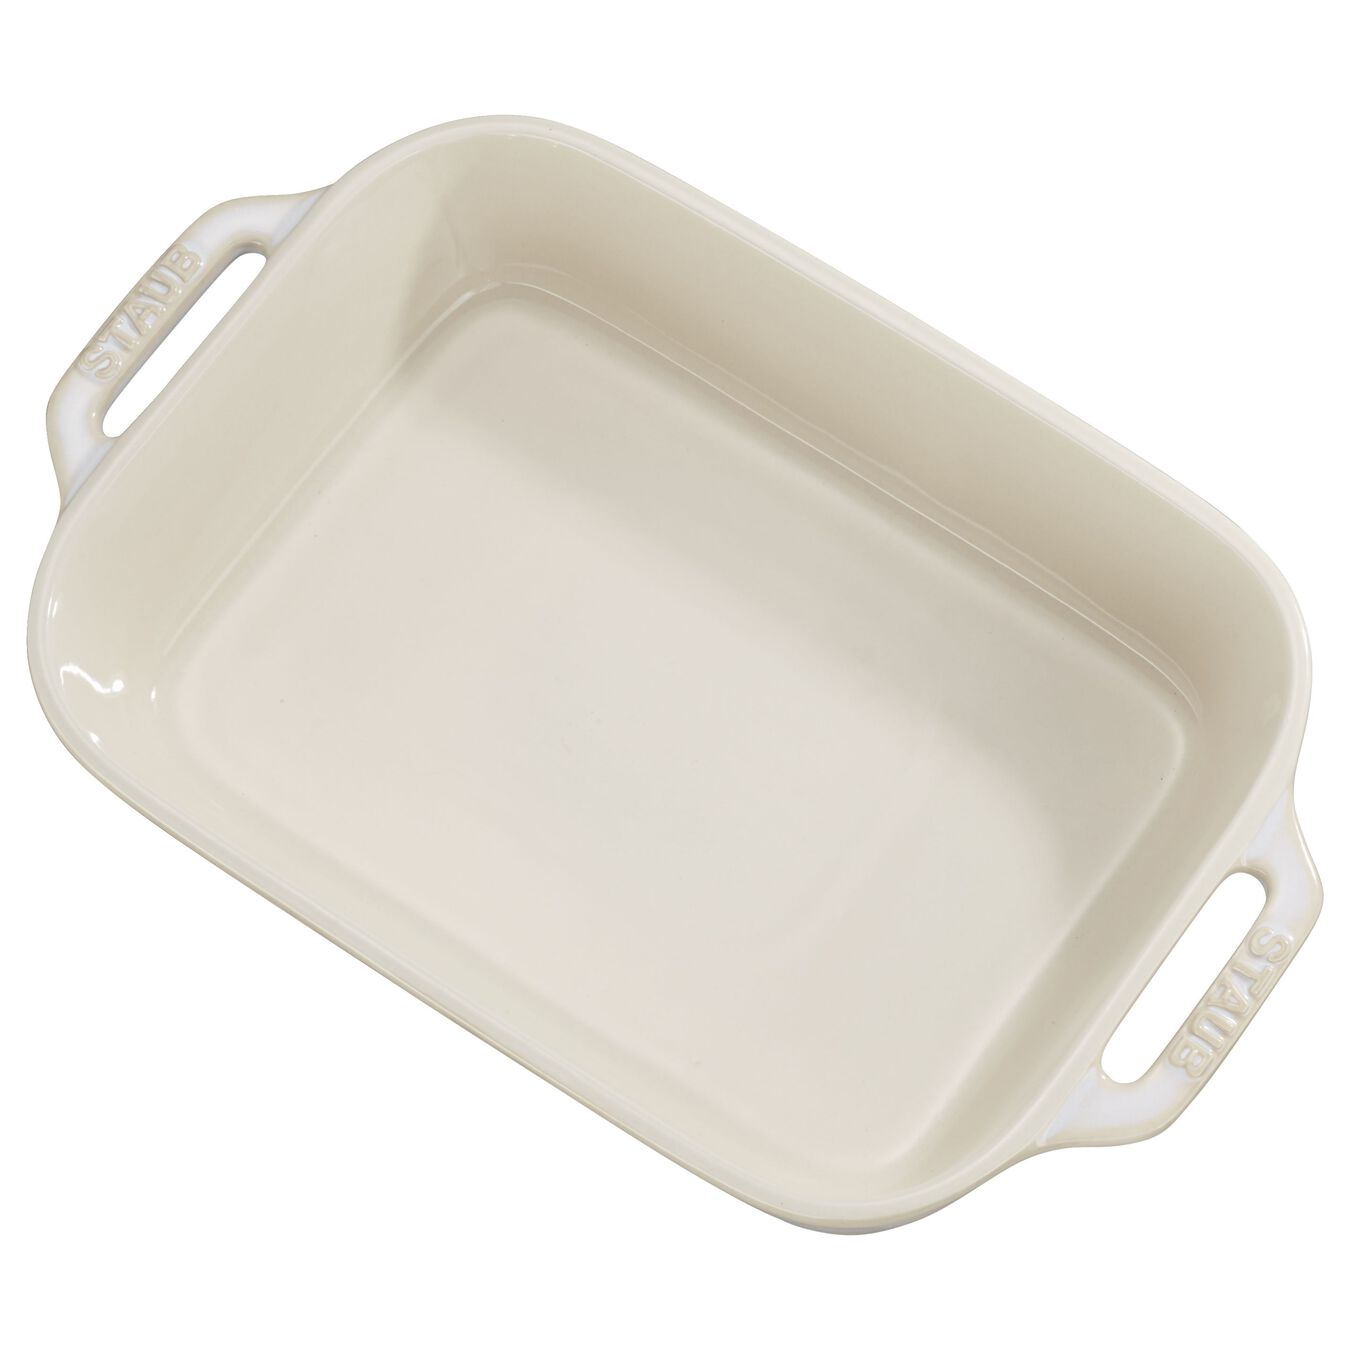 7.87 x 10.75 inch, rectangular, Oven dish, ivory-white,,large 1